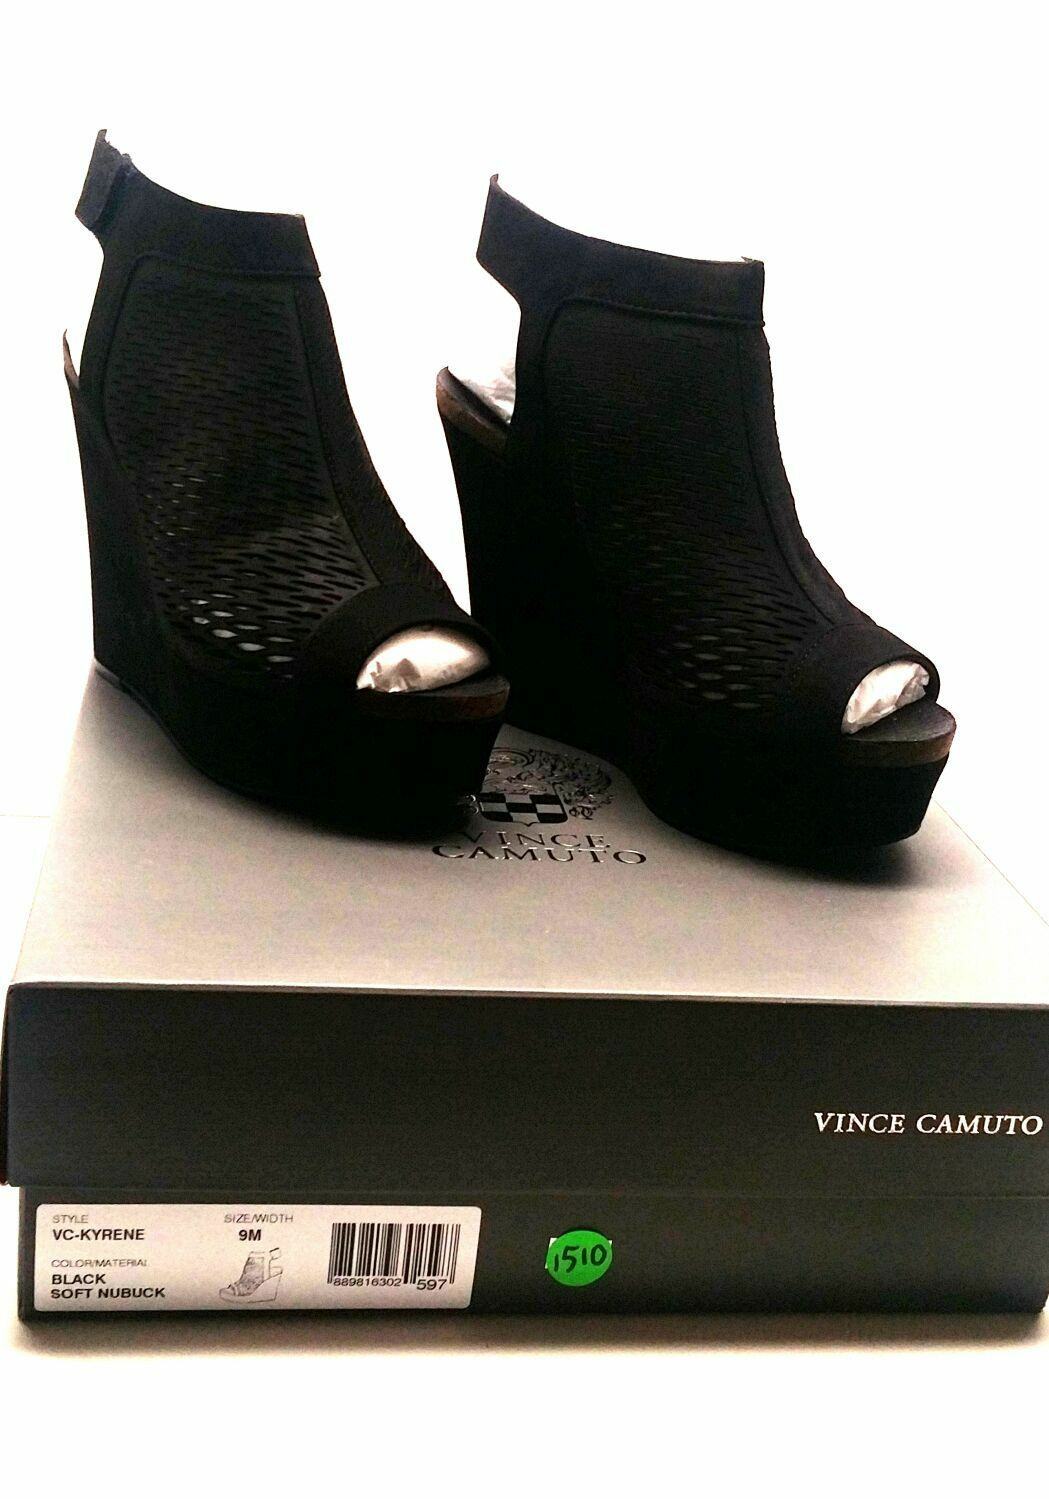 Vince Camuto Kyrene Black Woman Soft Nubuck shoes